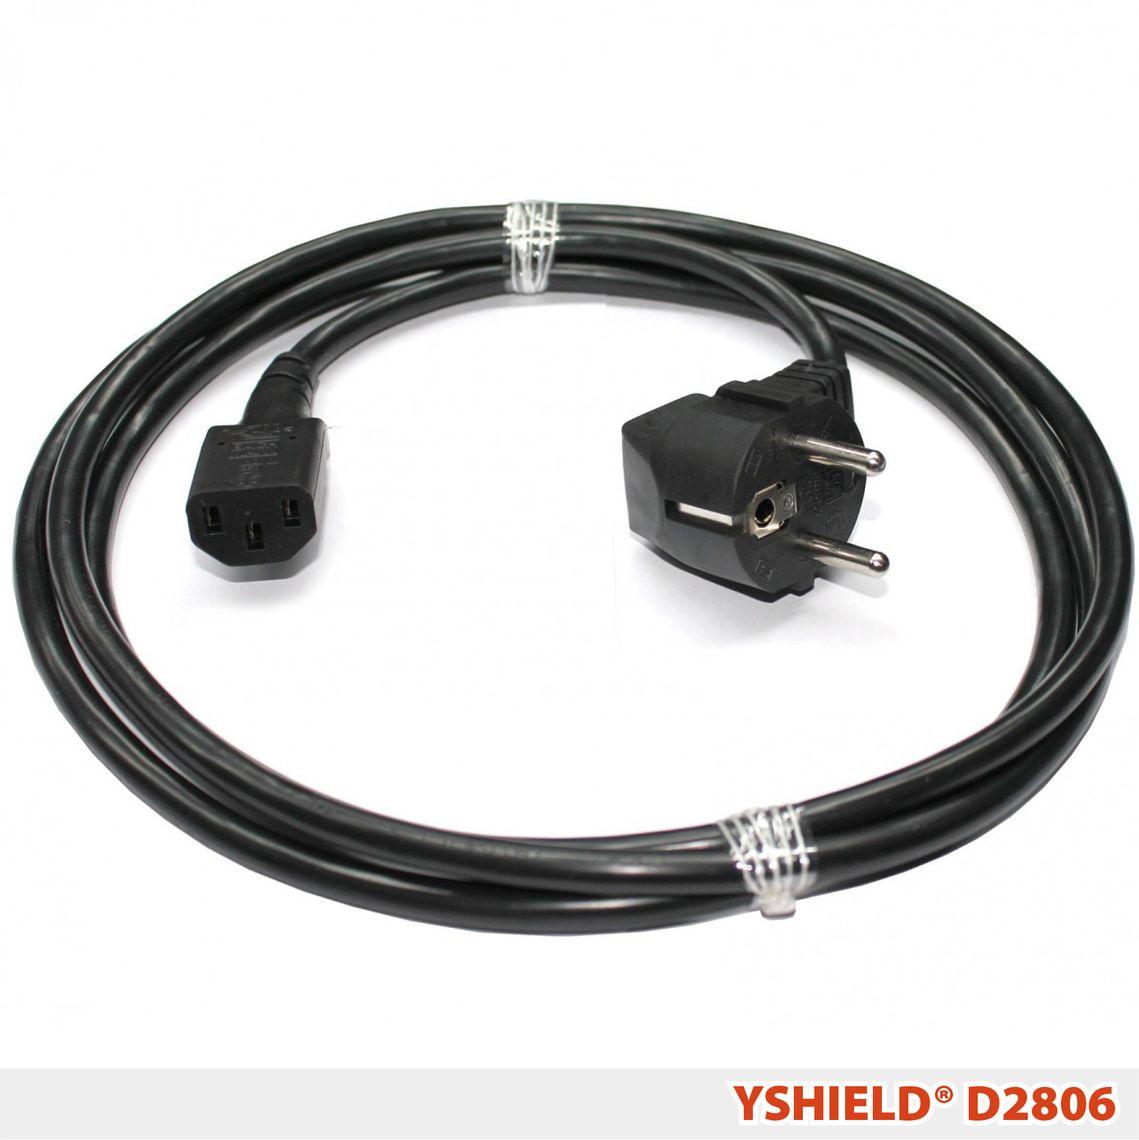 D2806 | Shielded power cord | 2 m black